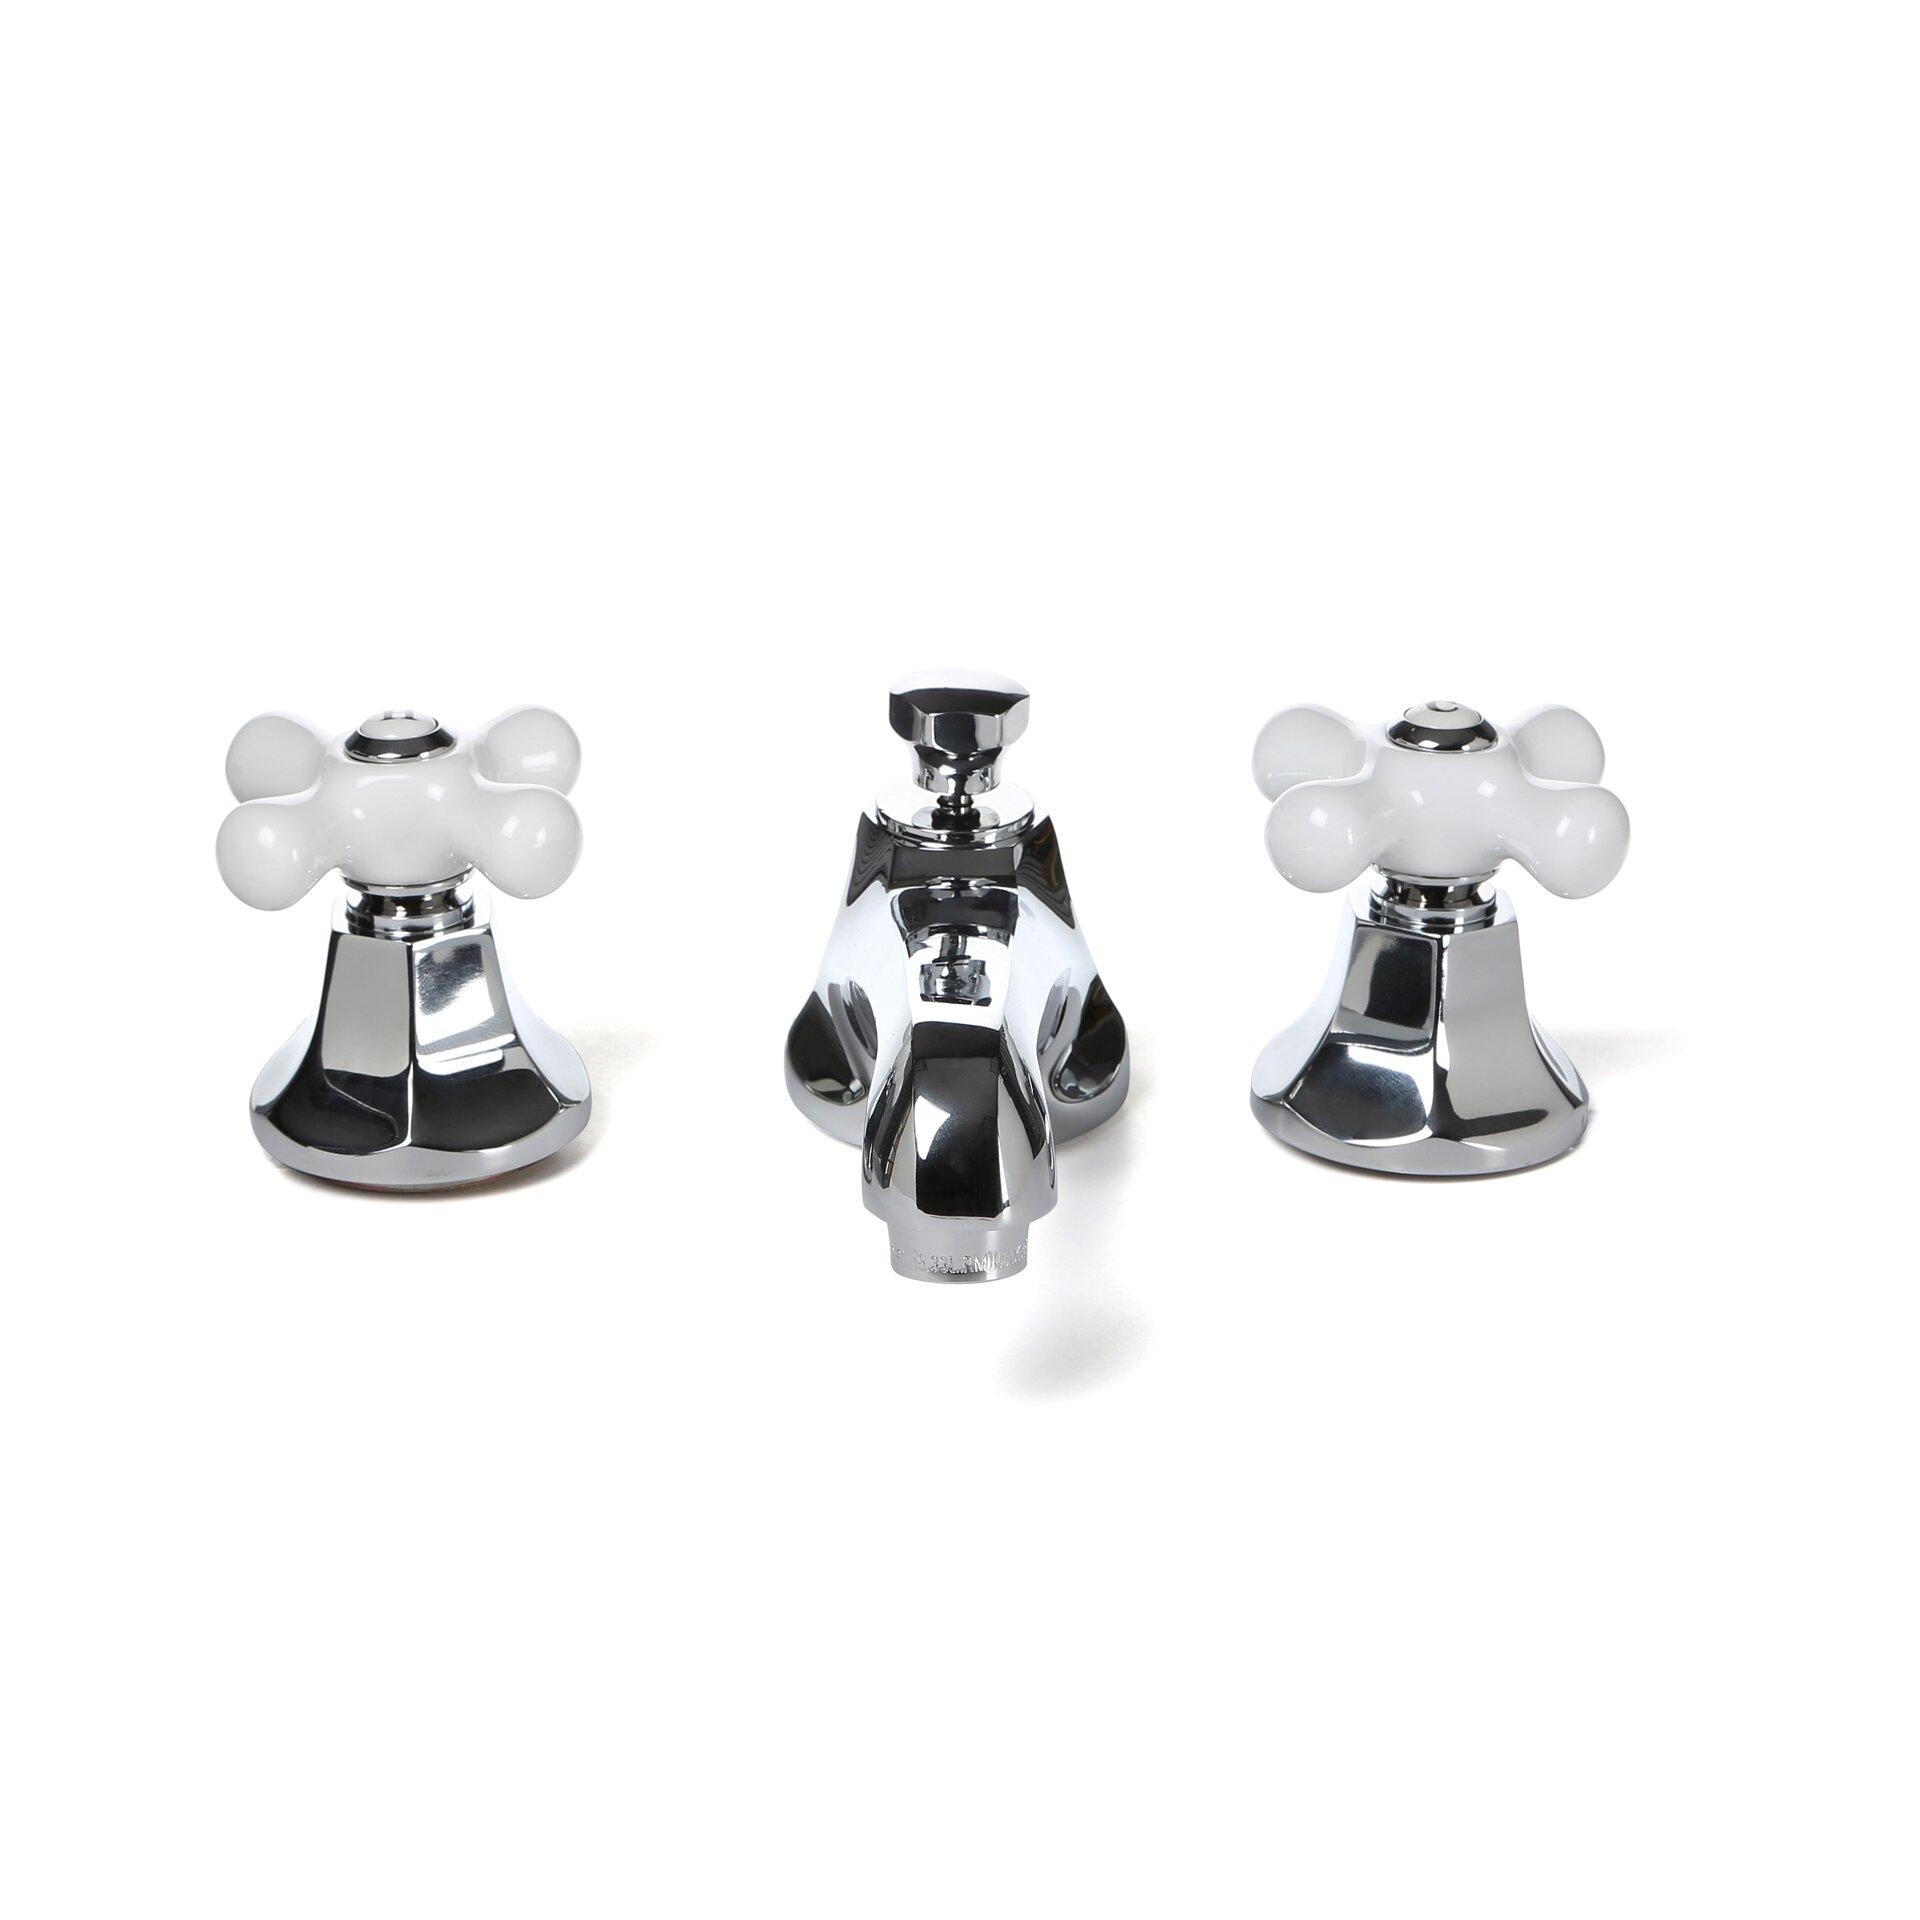 Cross Handle Bathroom Faucet Elements Of Design Metropolitan Widespread Bathroom Faucet With